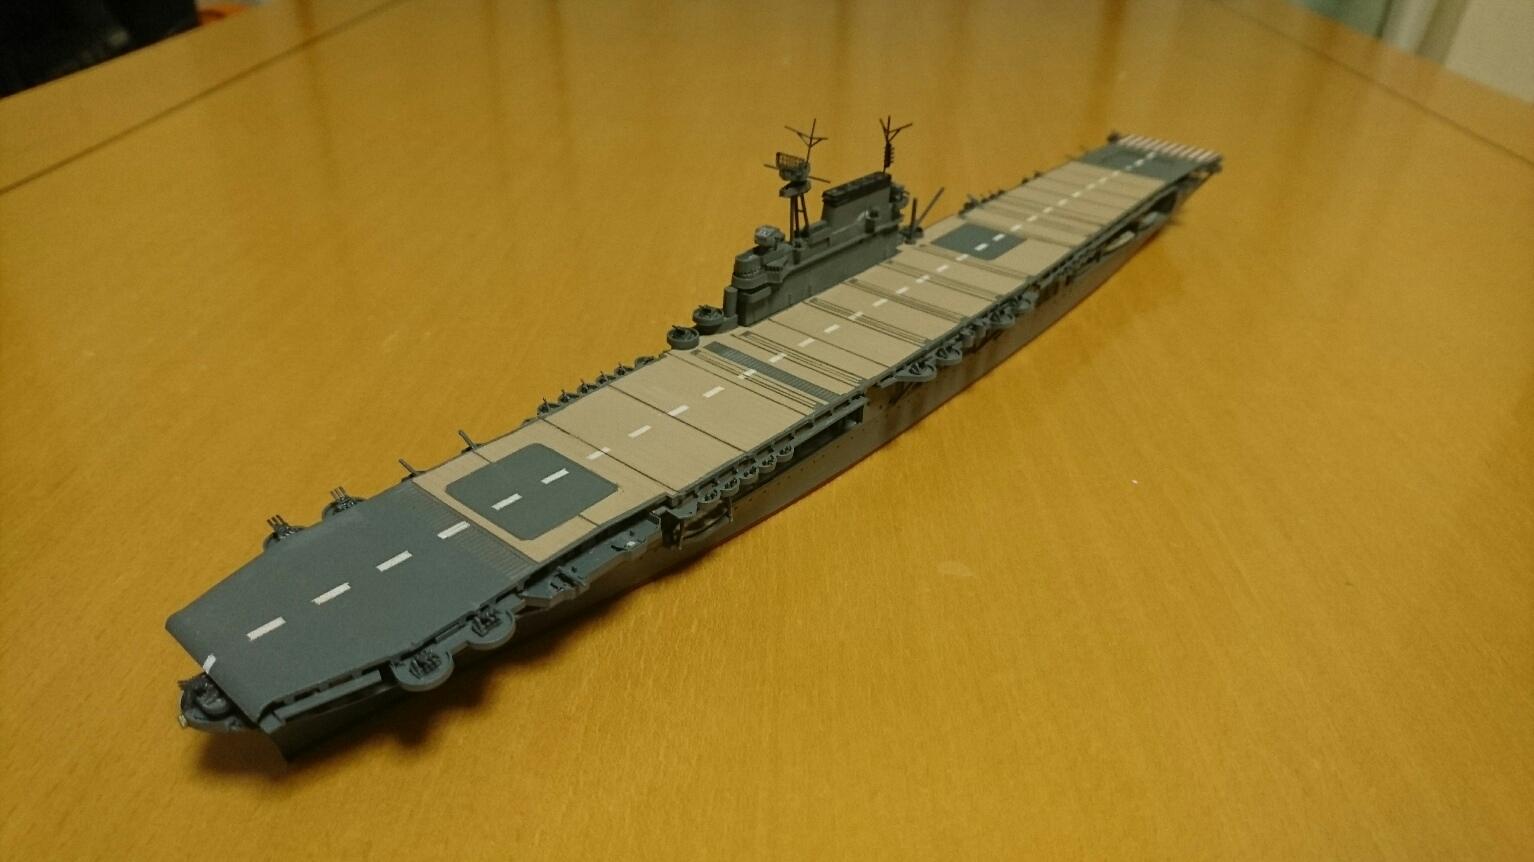 kumaの模型趣味: 鹵獲ホーネット...